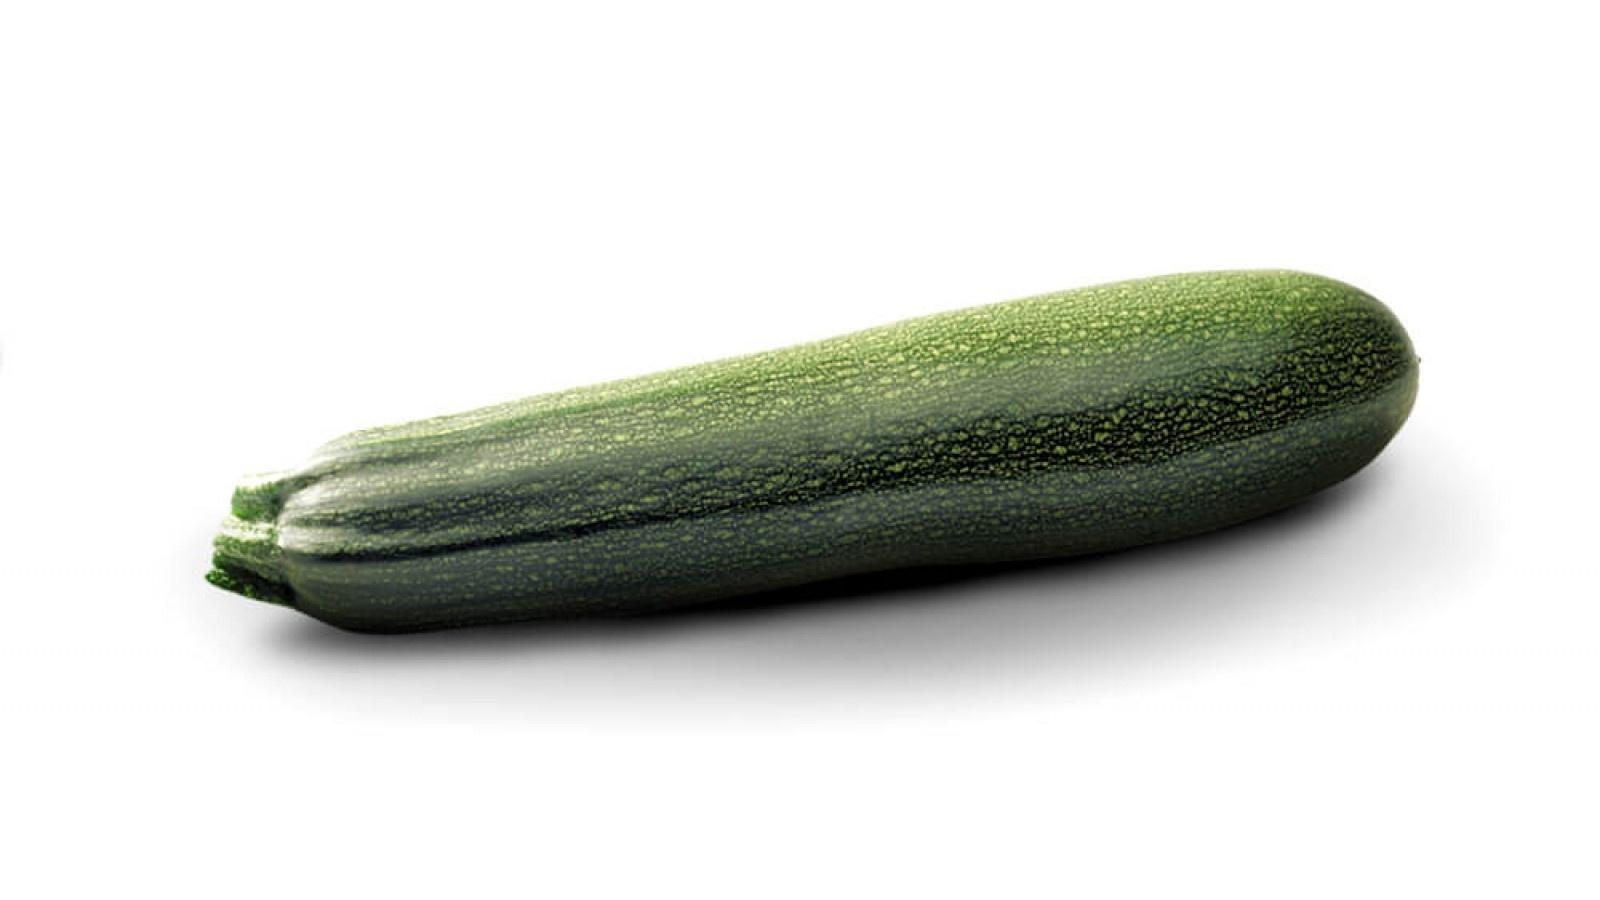 Claessens Courgette groen /stuk